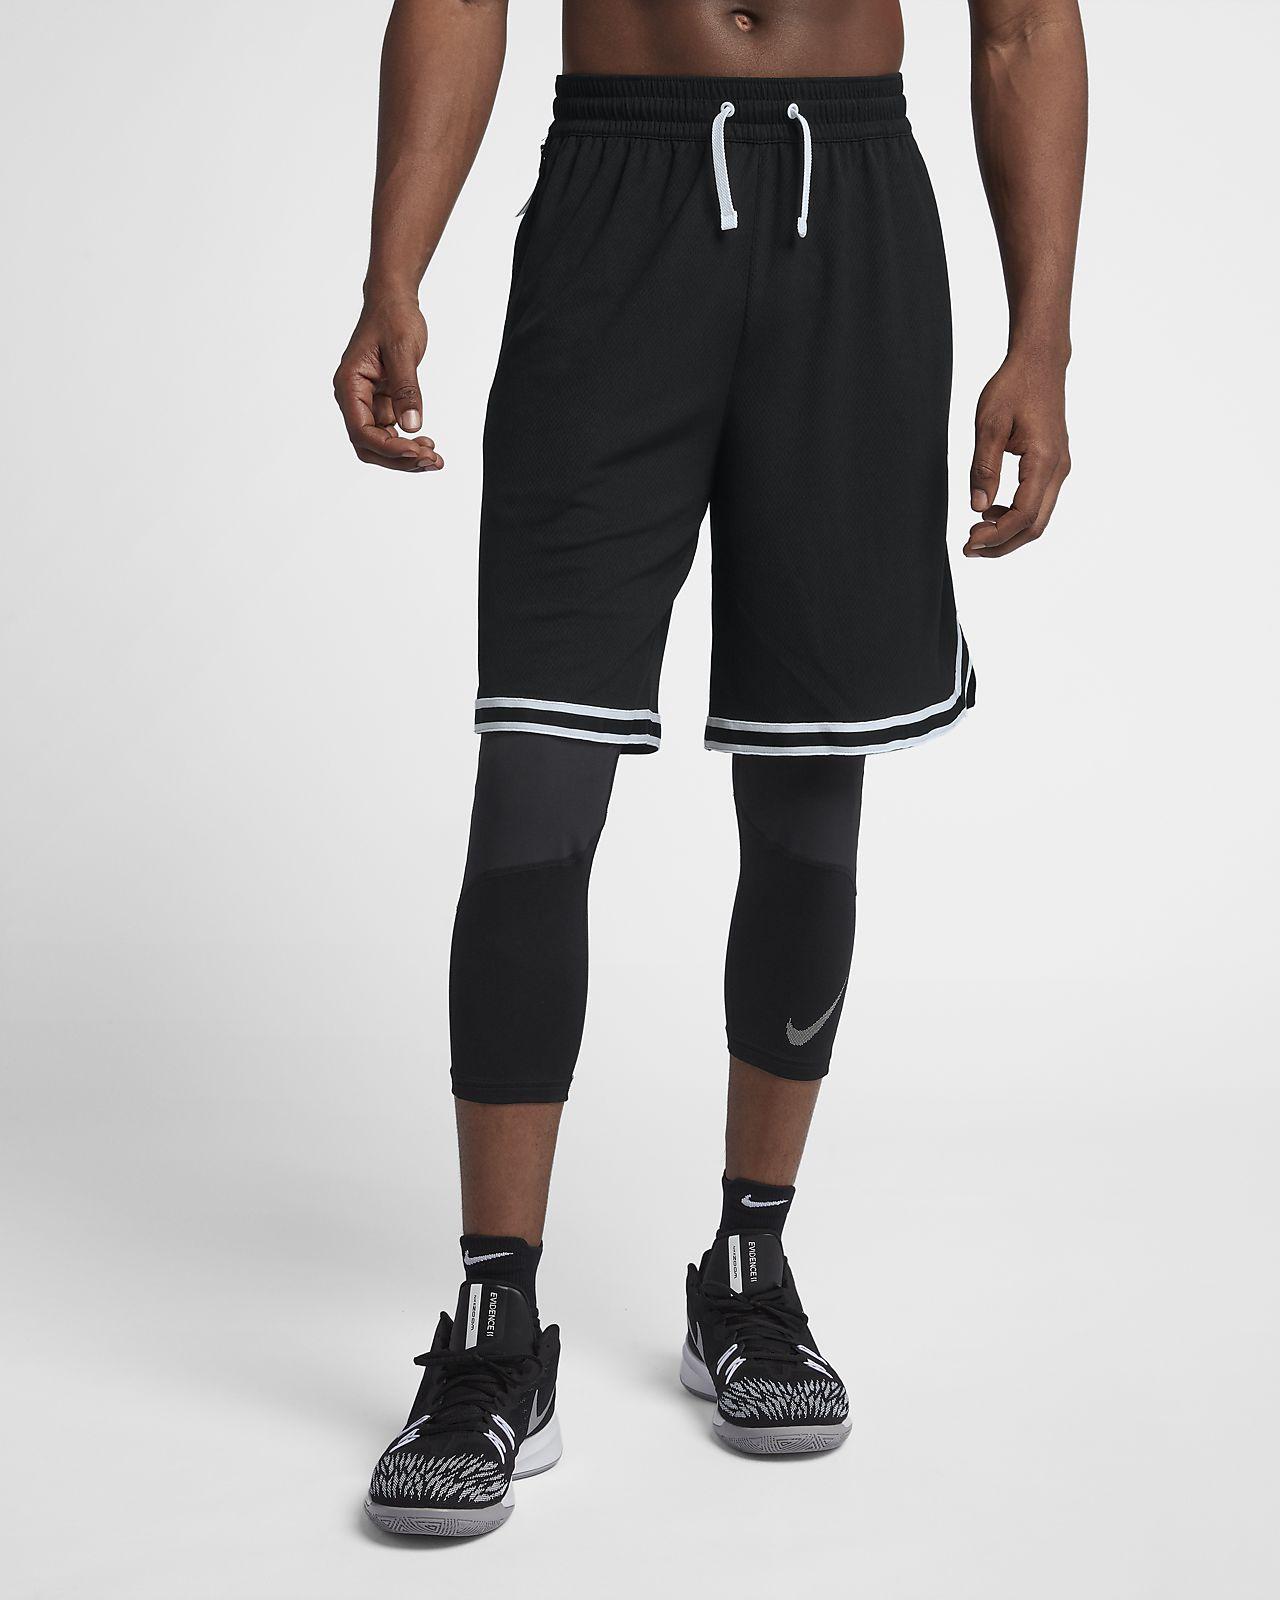 Dna It Nike Da Basket Shorts Uomo Dri Fit wxZP841Xq